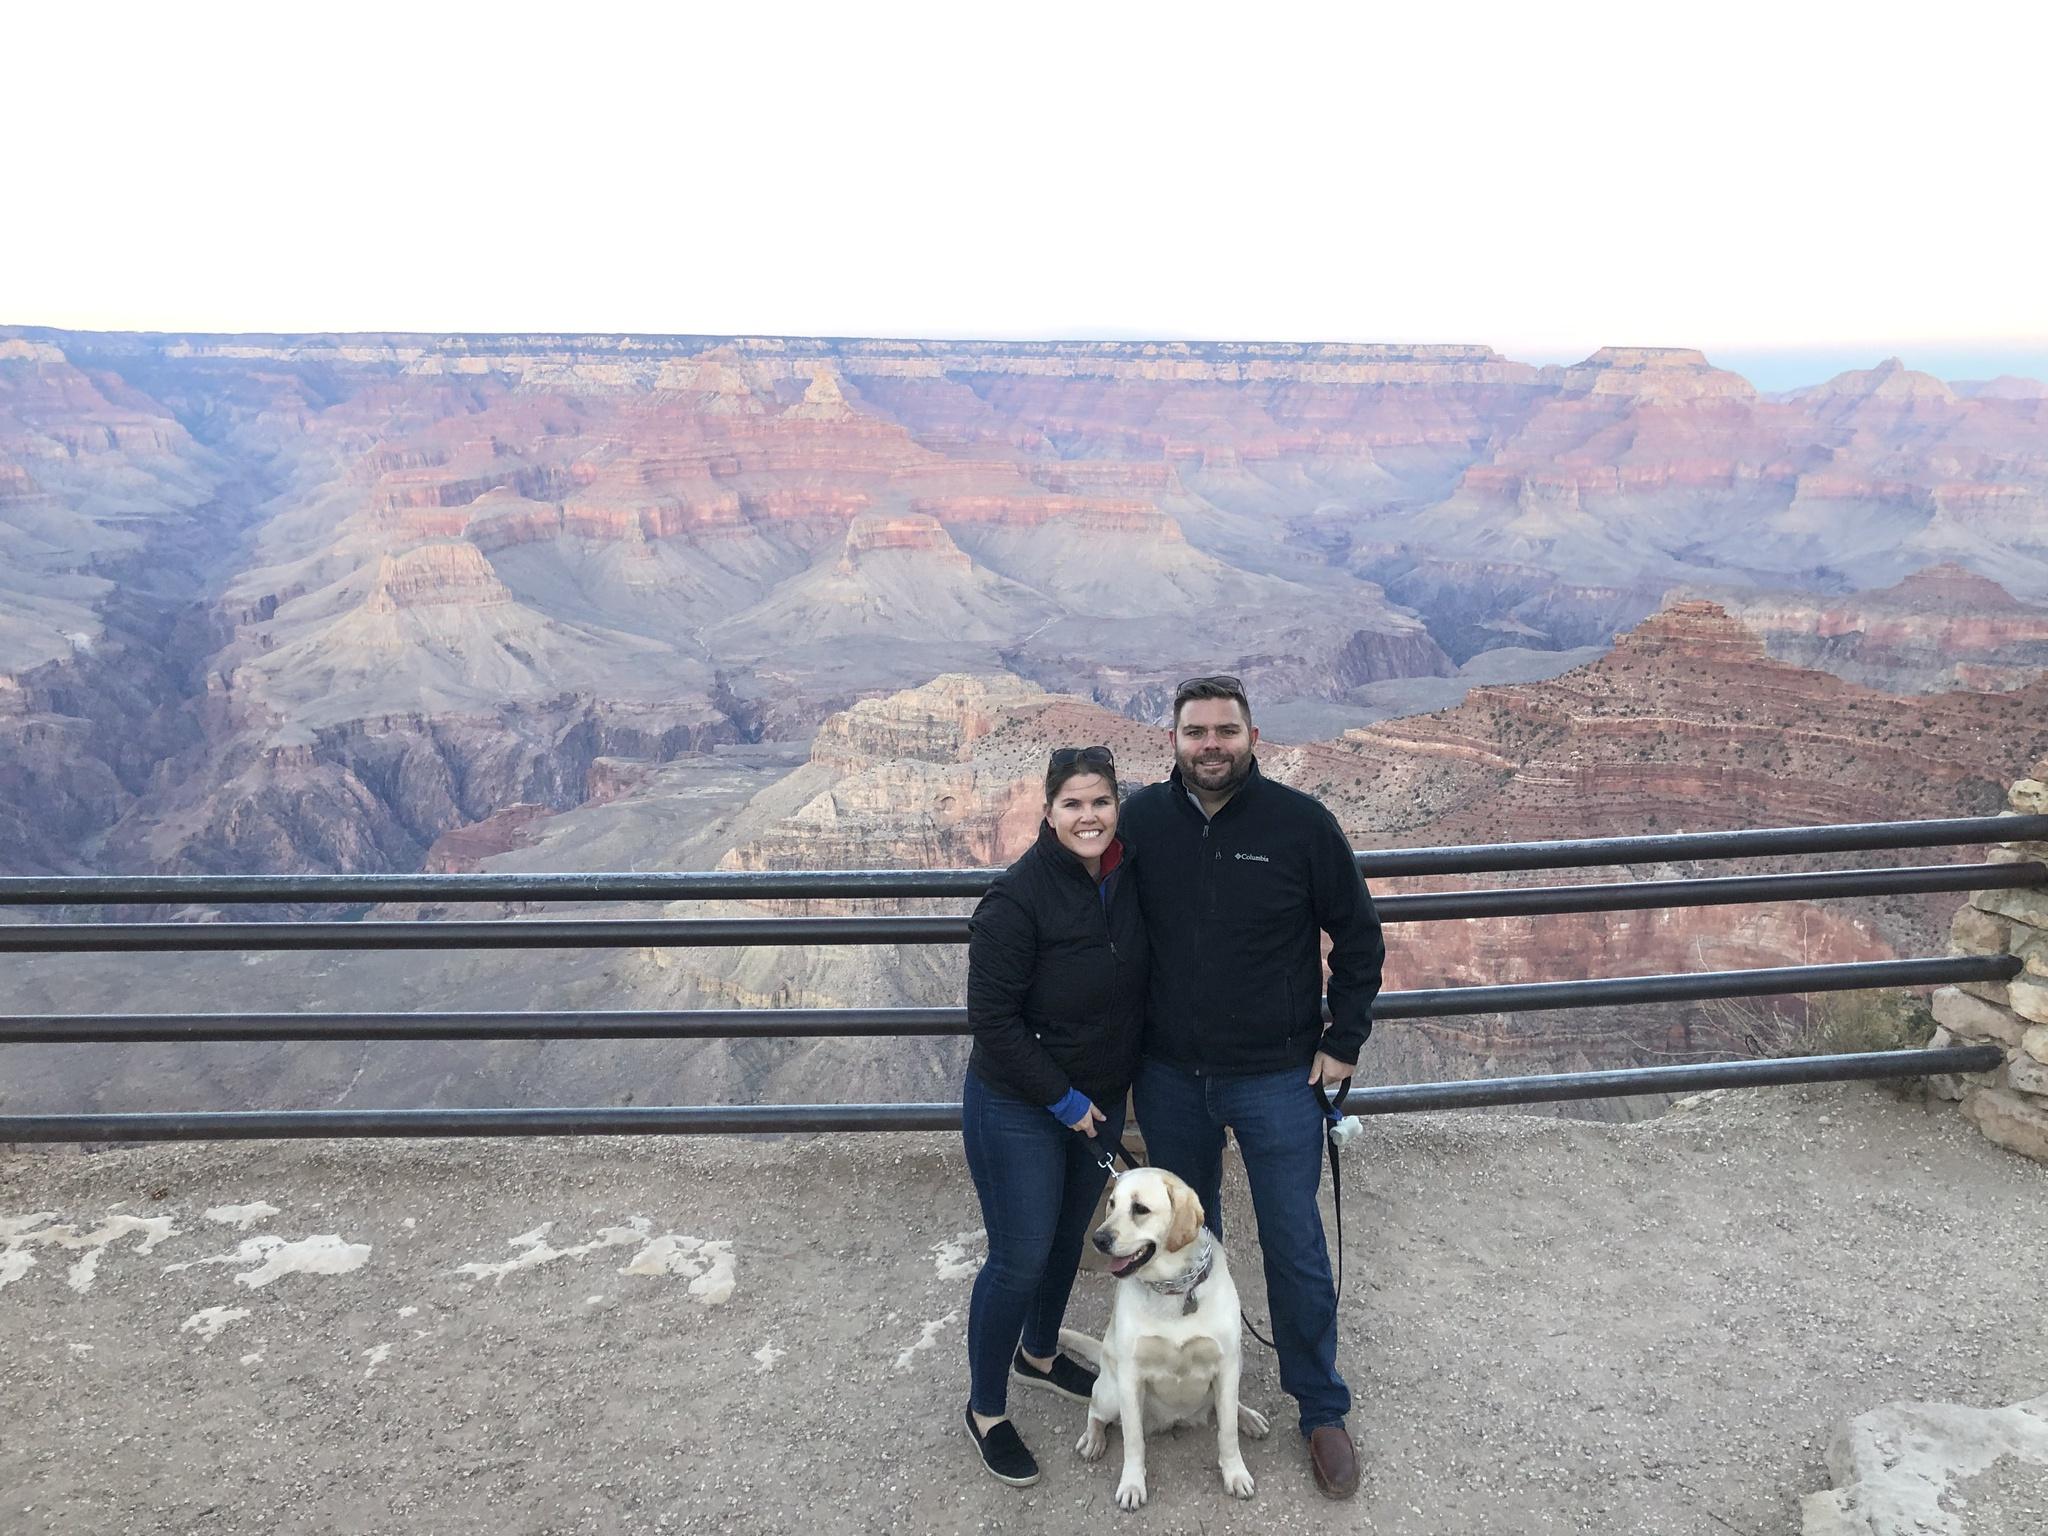 Grand Canyon, December 2020